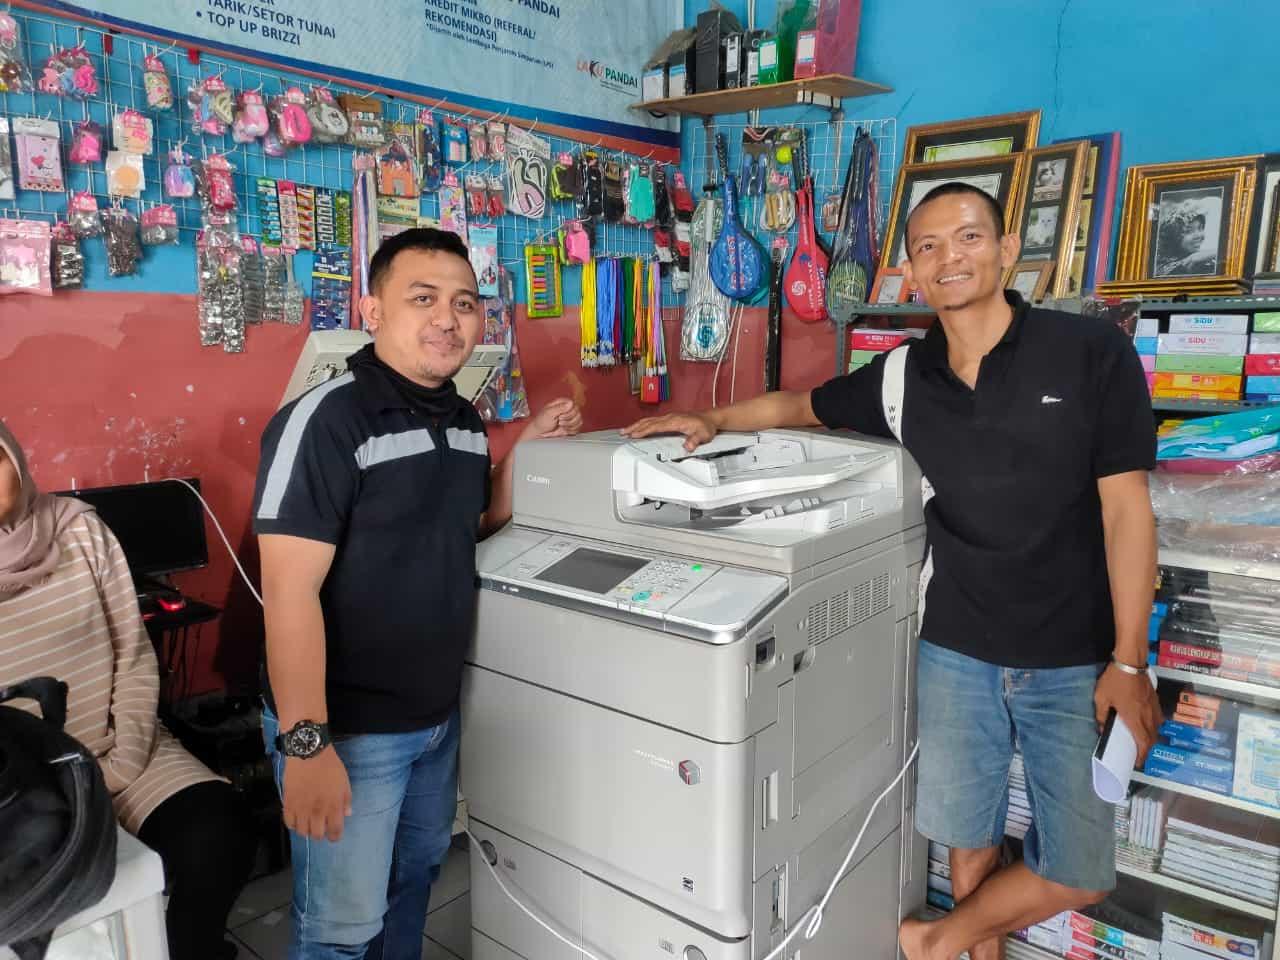 Pengiriman Penjualan Mesin Fotocopy Mesin Fotocopy Canon Ira 6055 | 6255 - Paket Usaha Fotocopy Milik Bp. Ahmad Yusuf